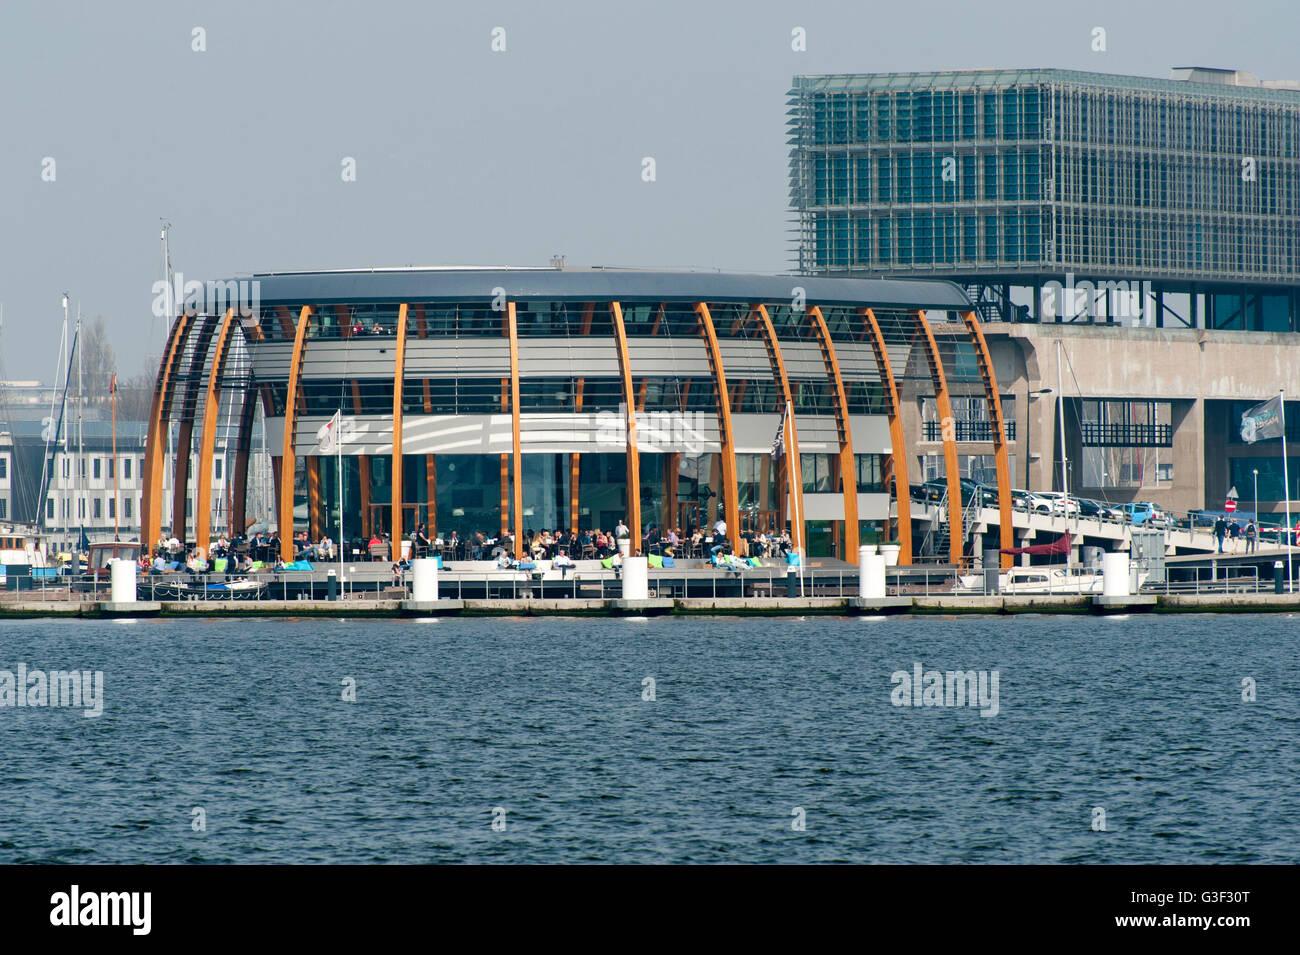 Ij, restaurant 'Loetje', Amsterdam-Noord (borough), Amsterdam, Holland, Netherlands - Stock Image